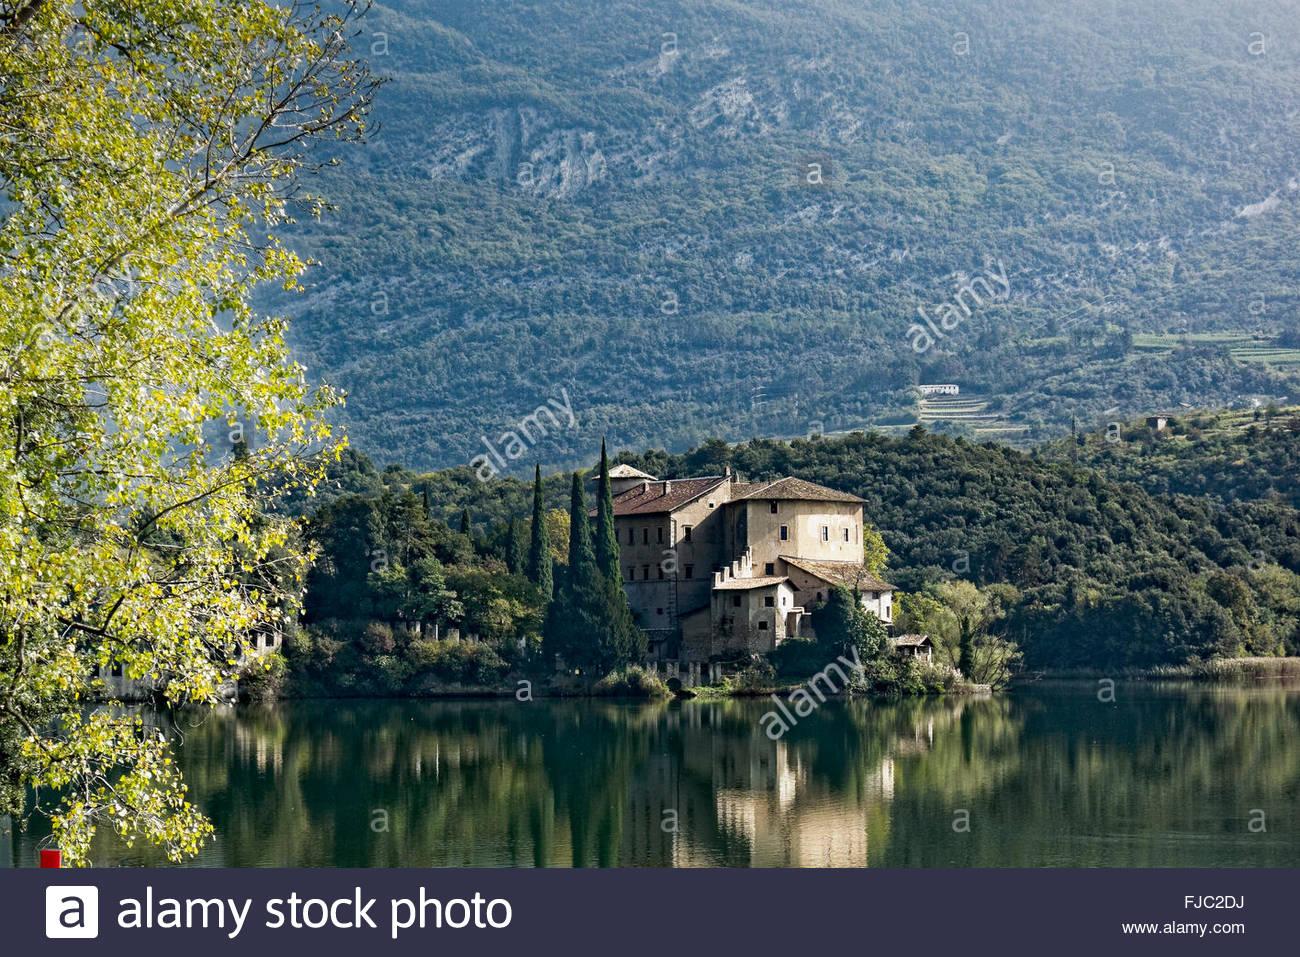 Lago Di Toblino Mit Schloss Castel Toblino, Trentino, Italien.